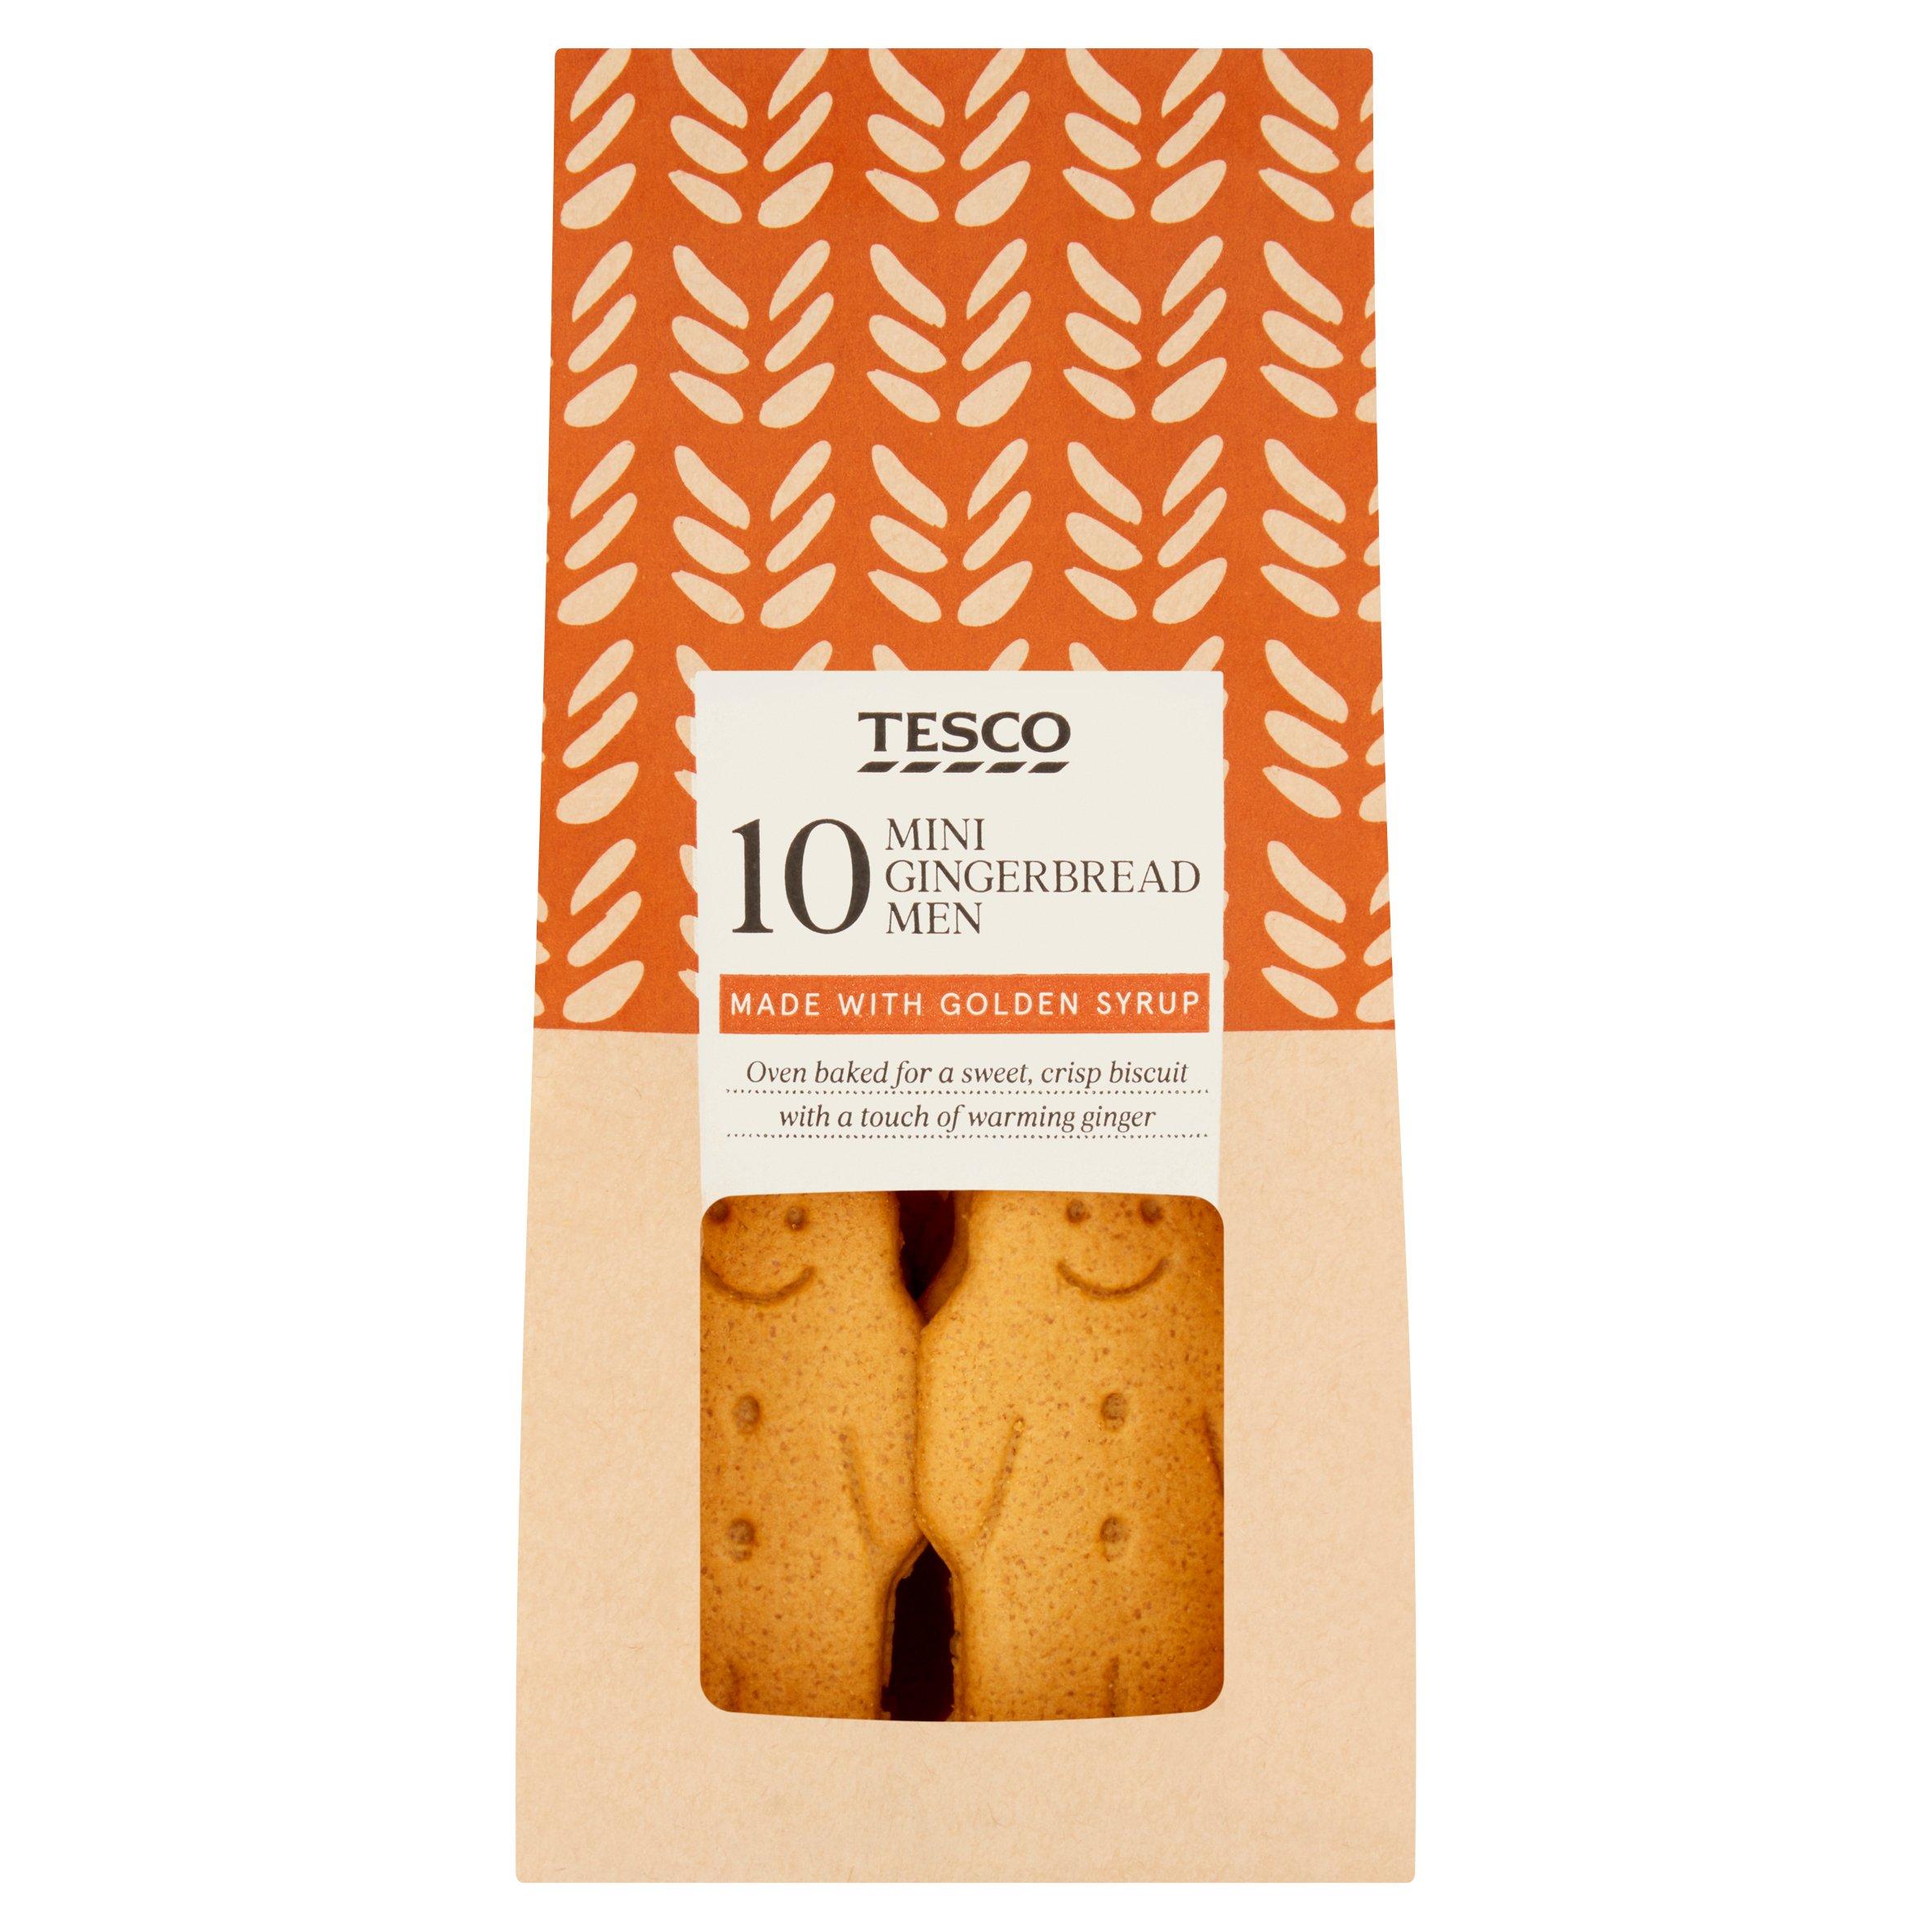 Tesco 10 Mini Gingerbread Men